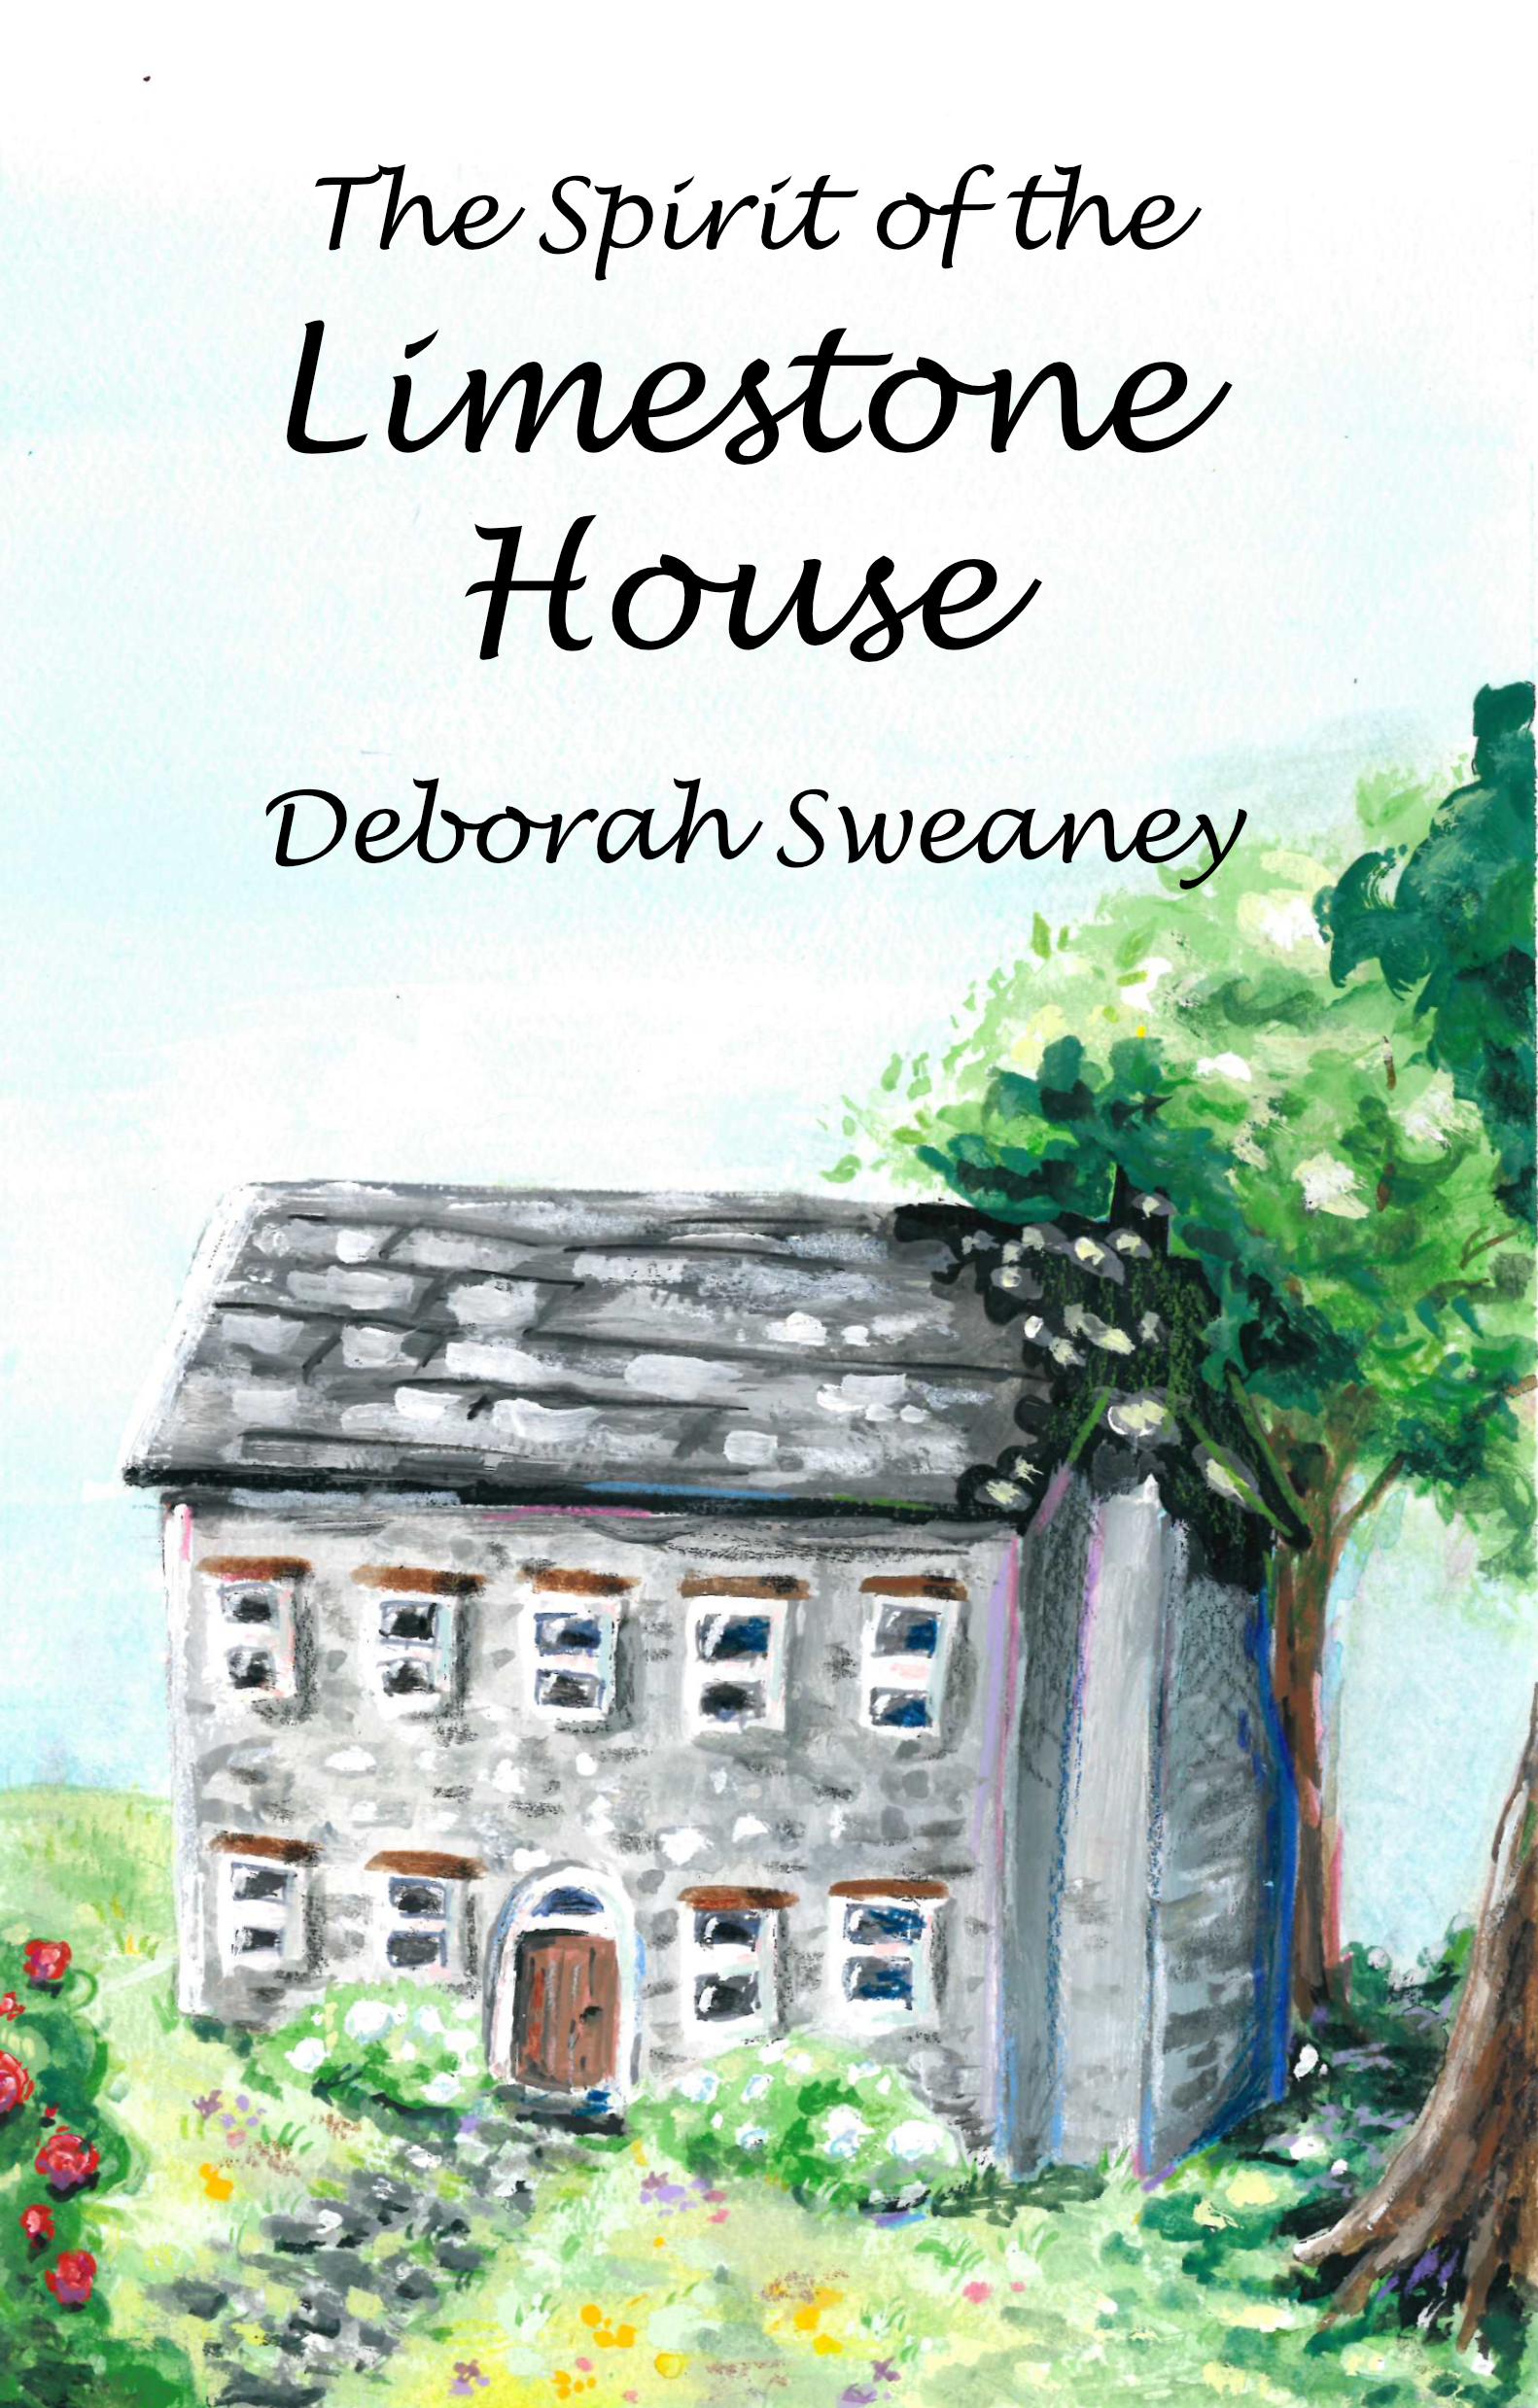 spirit of the limestone house front cover.jpg